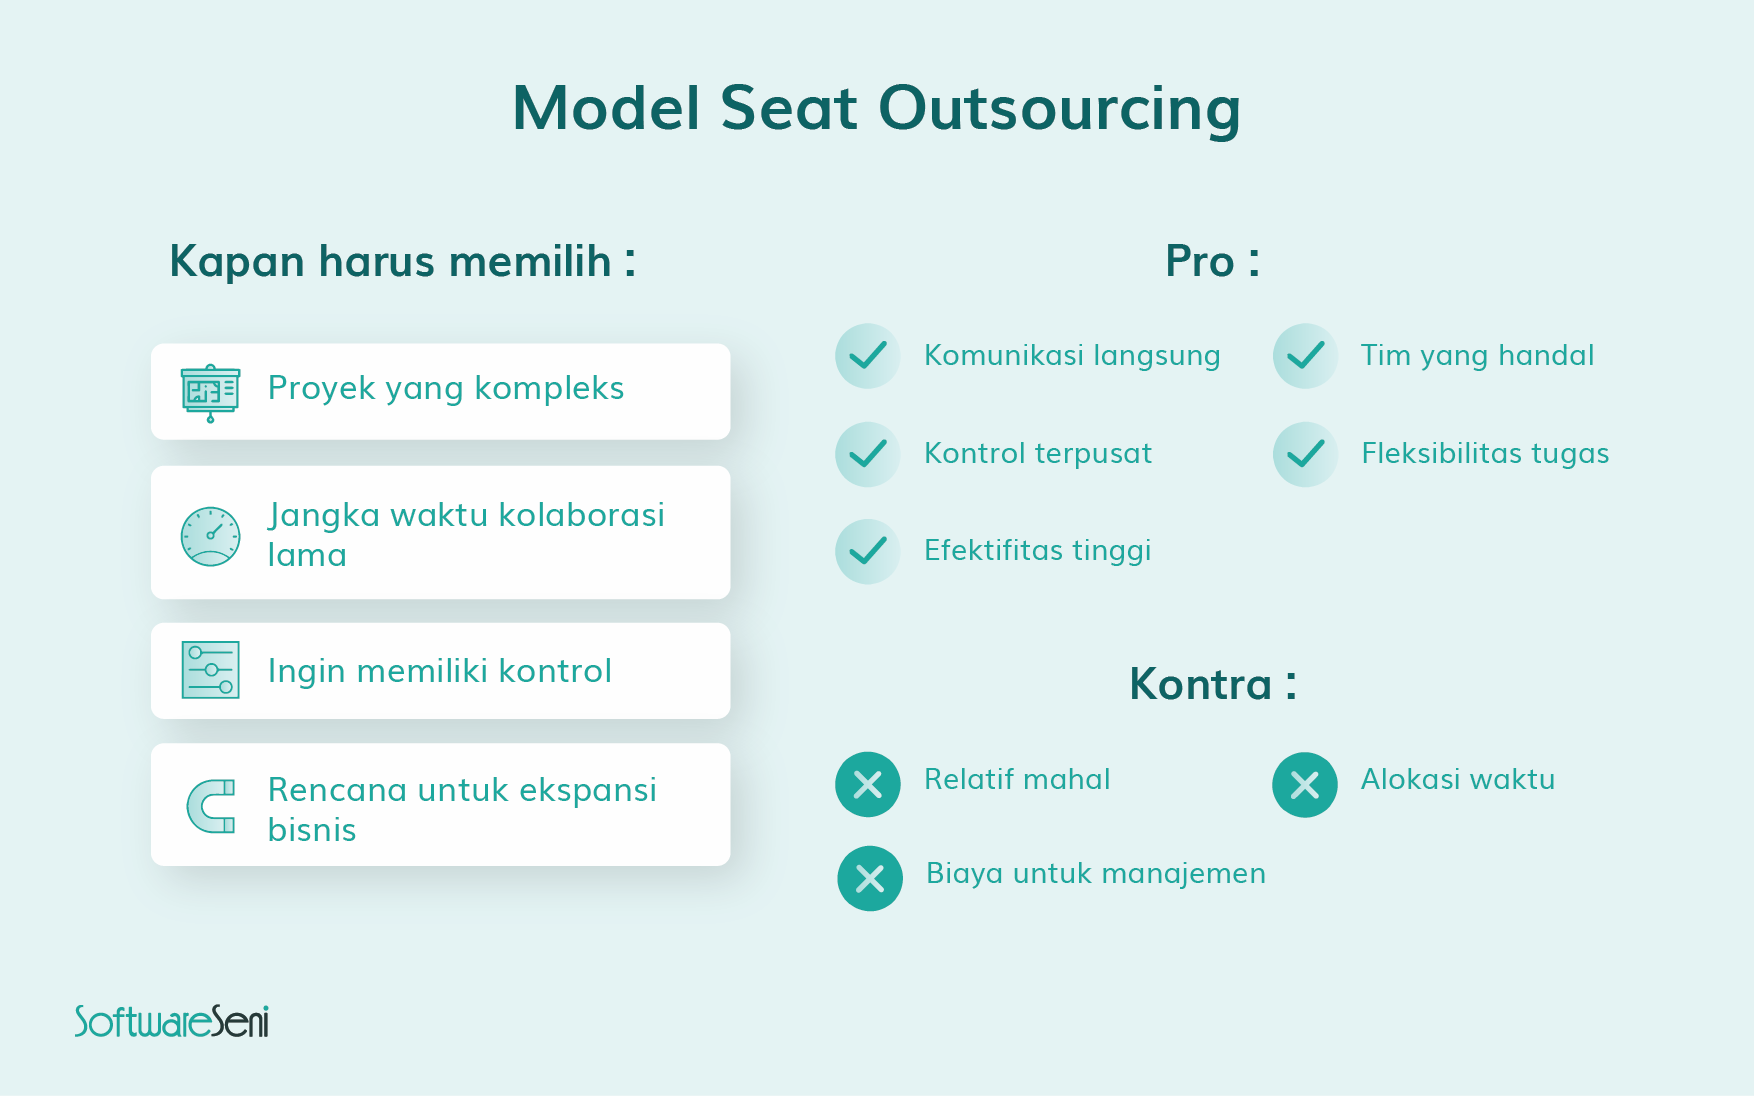 kontrak outsourcing